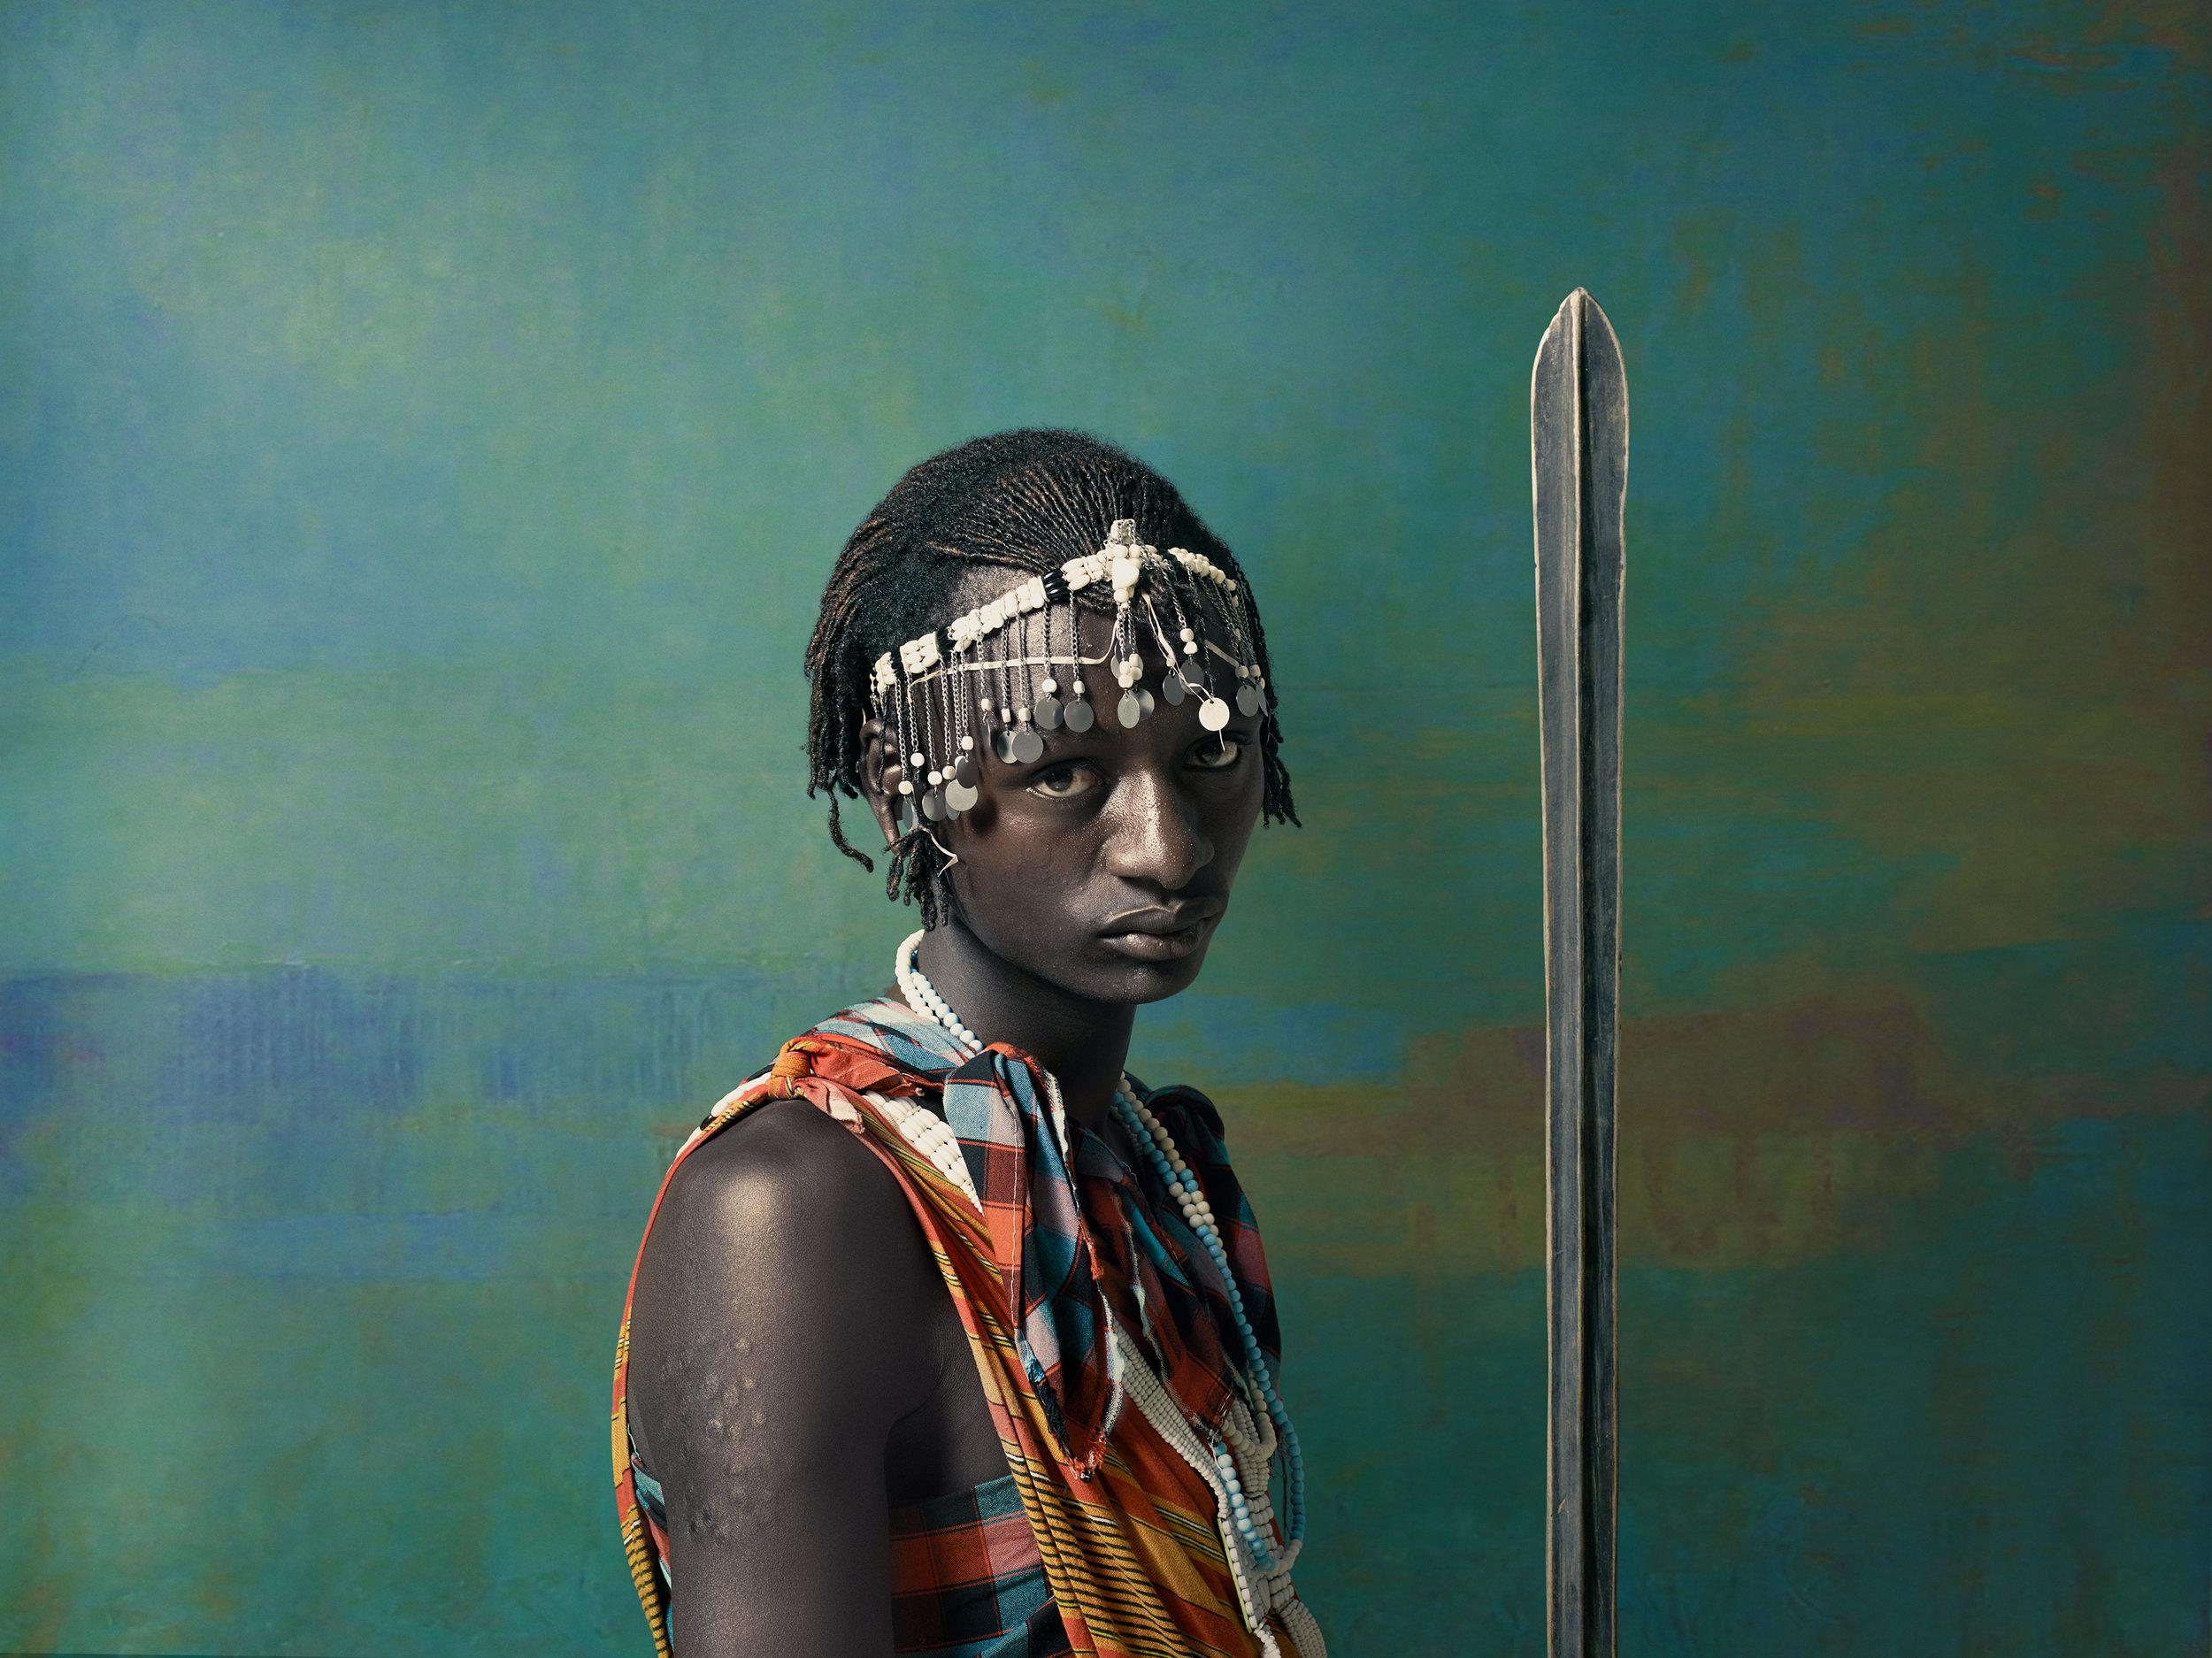 Tanzania_MaasaiWarriors_Studio_00266_FINAL.jpg